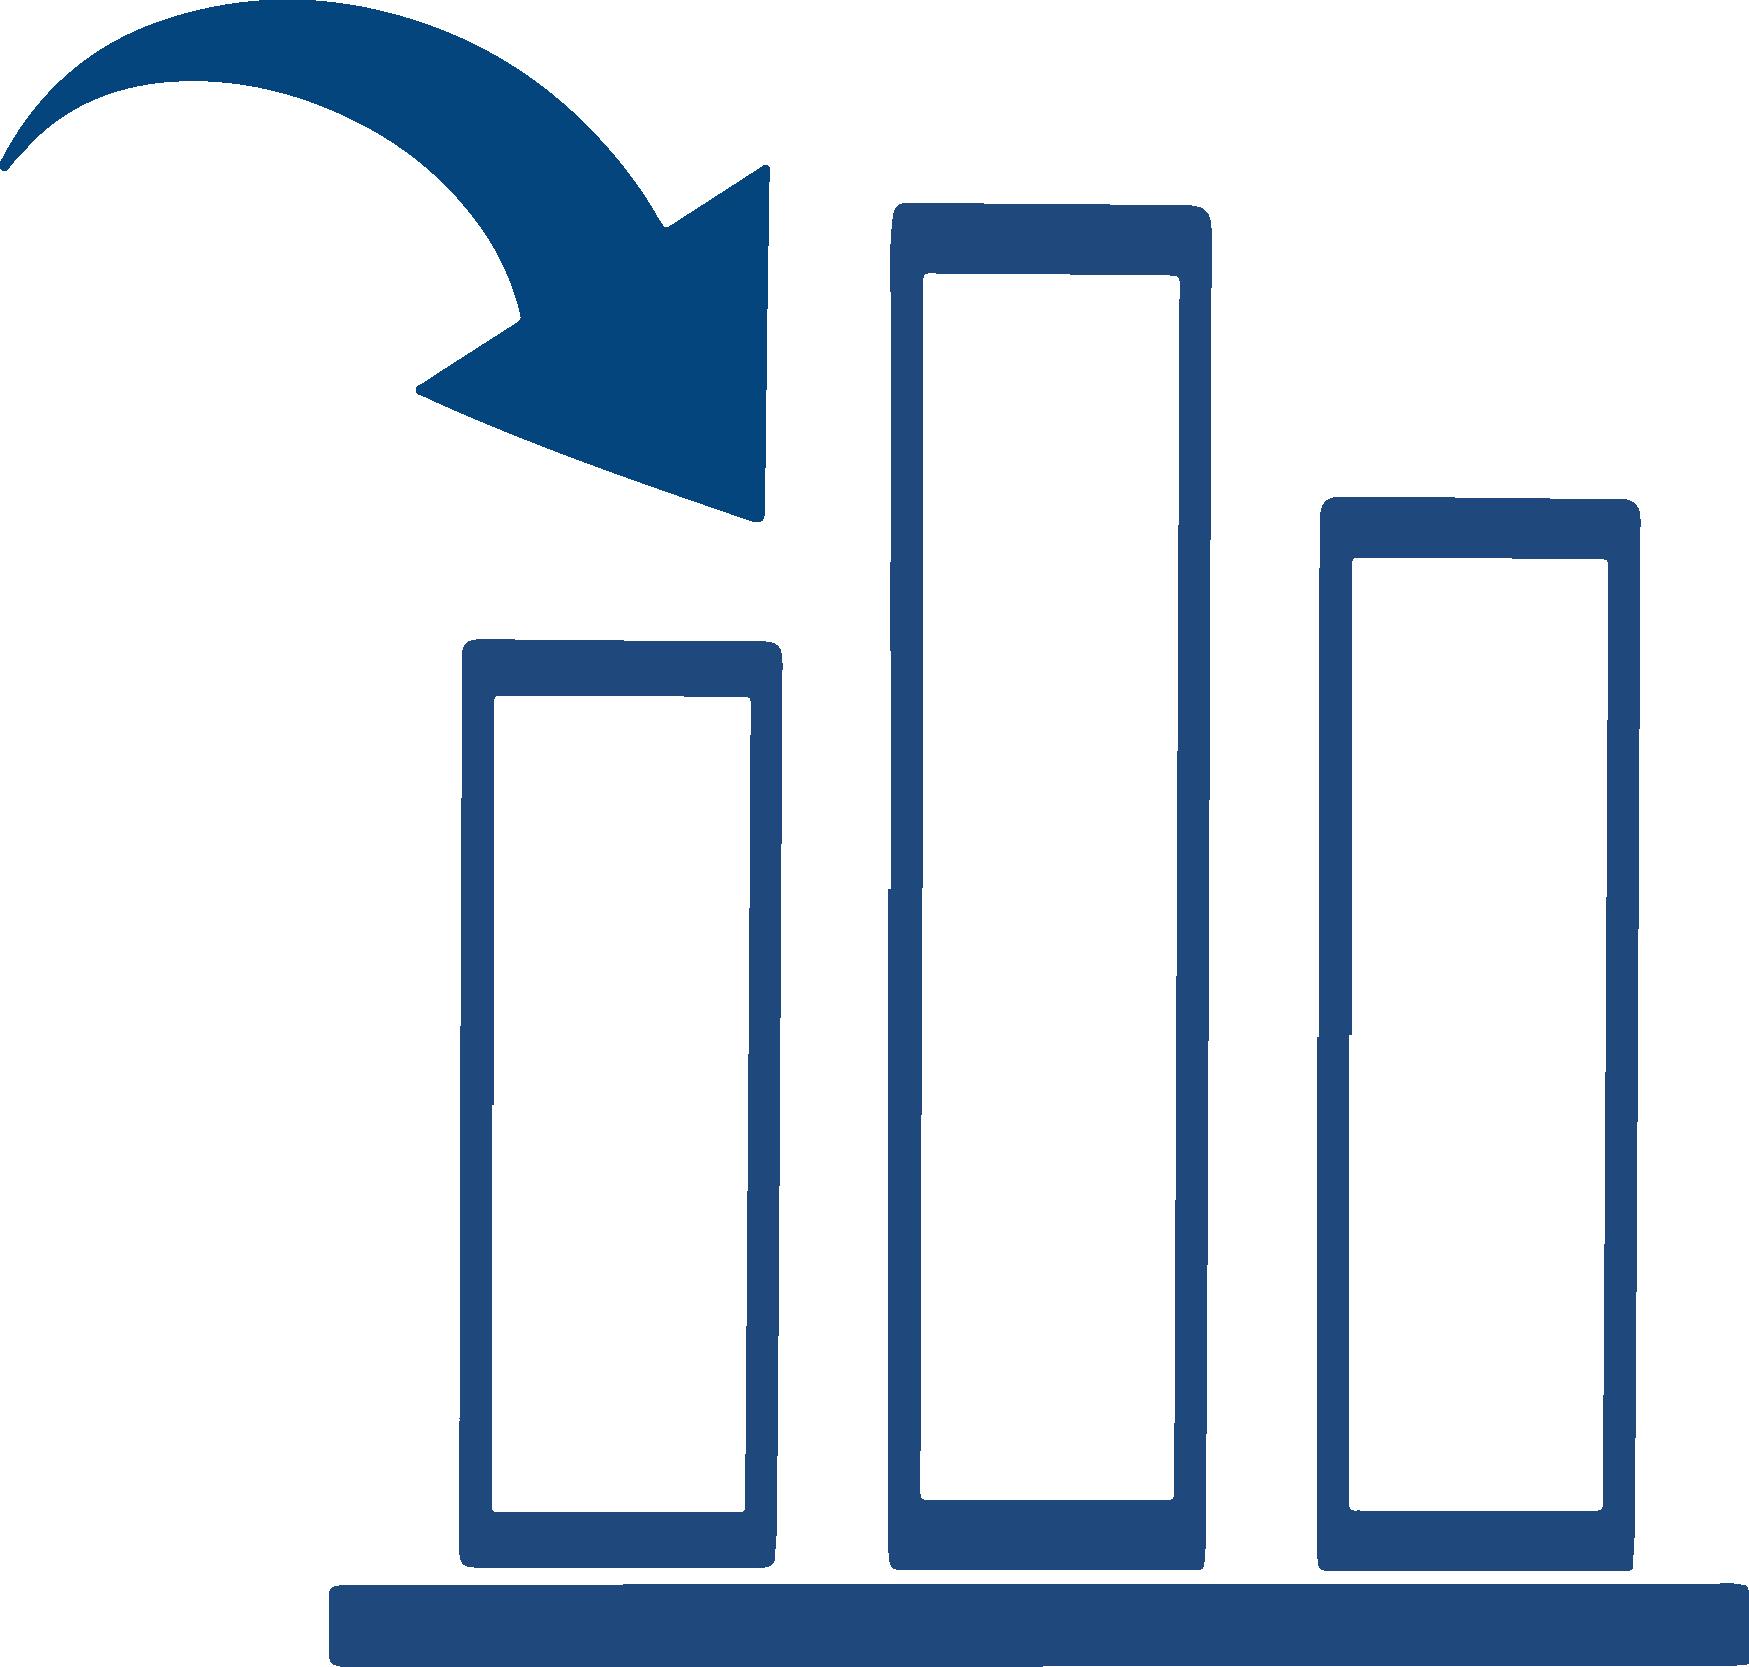 Statistical purposes icon